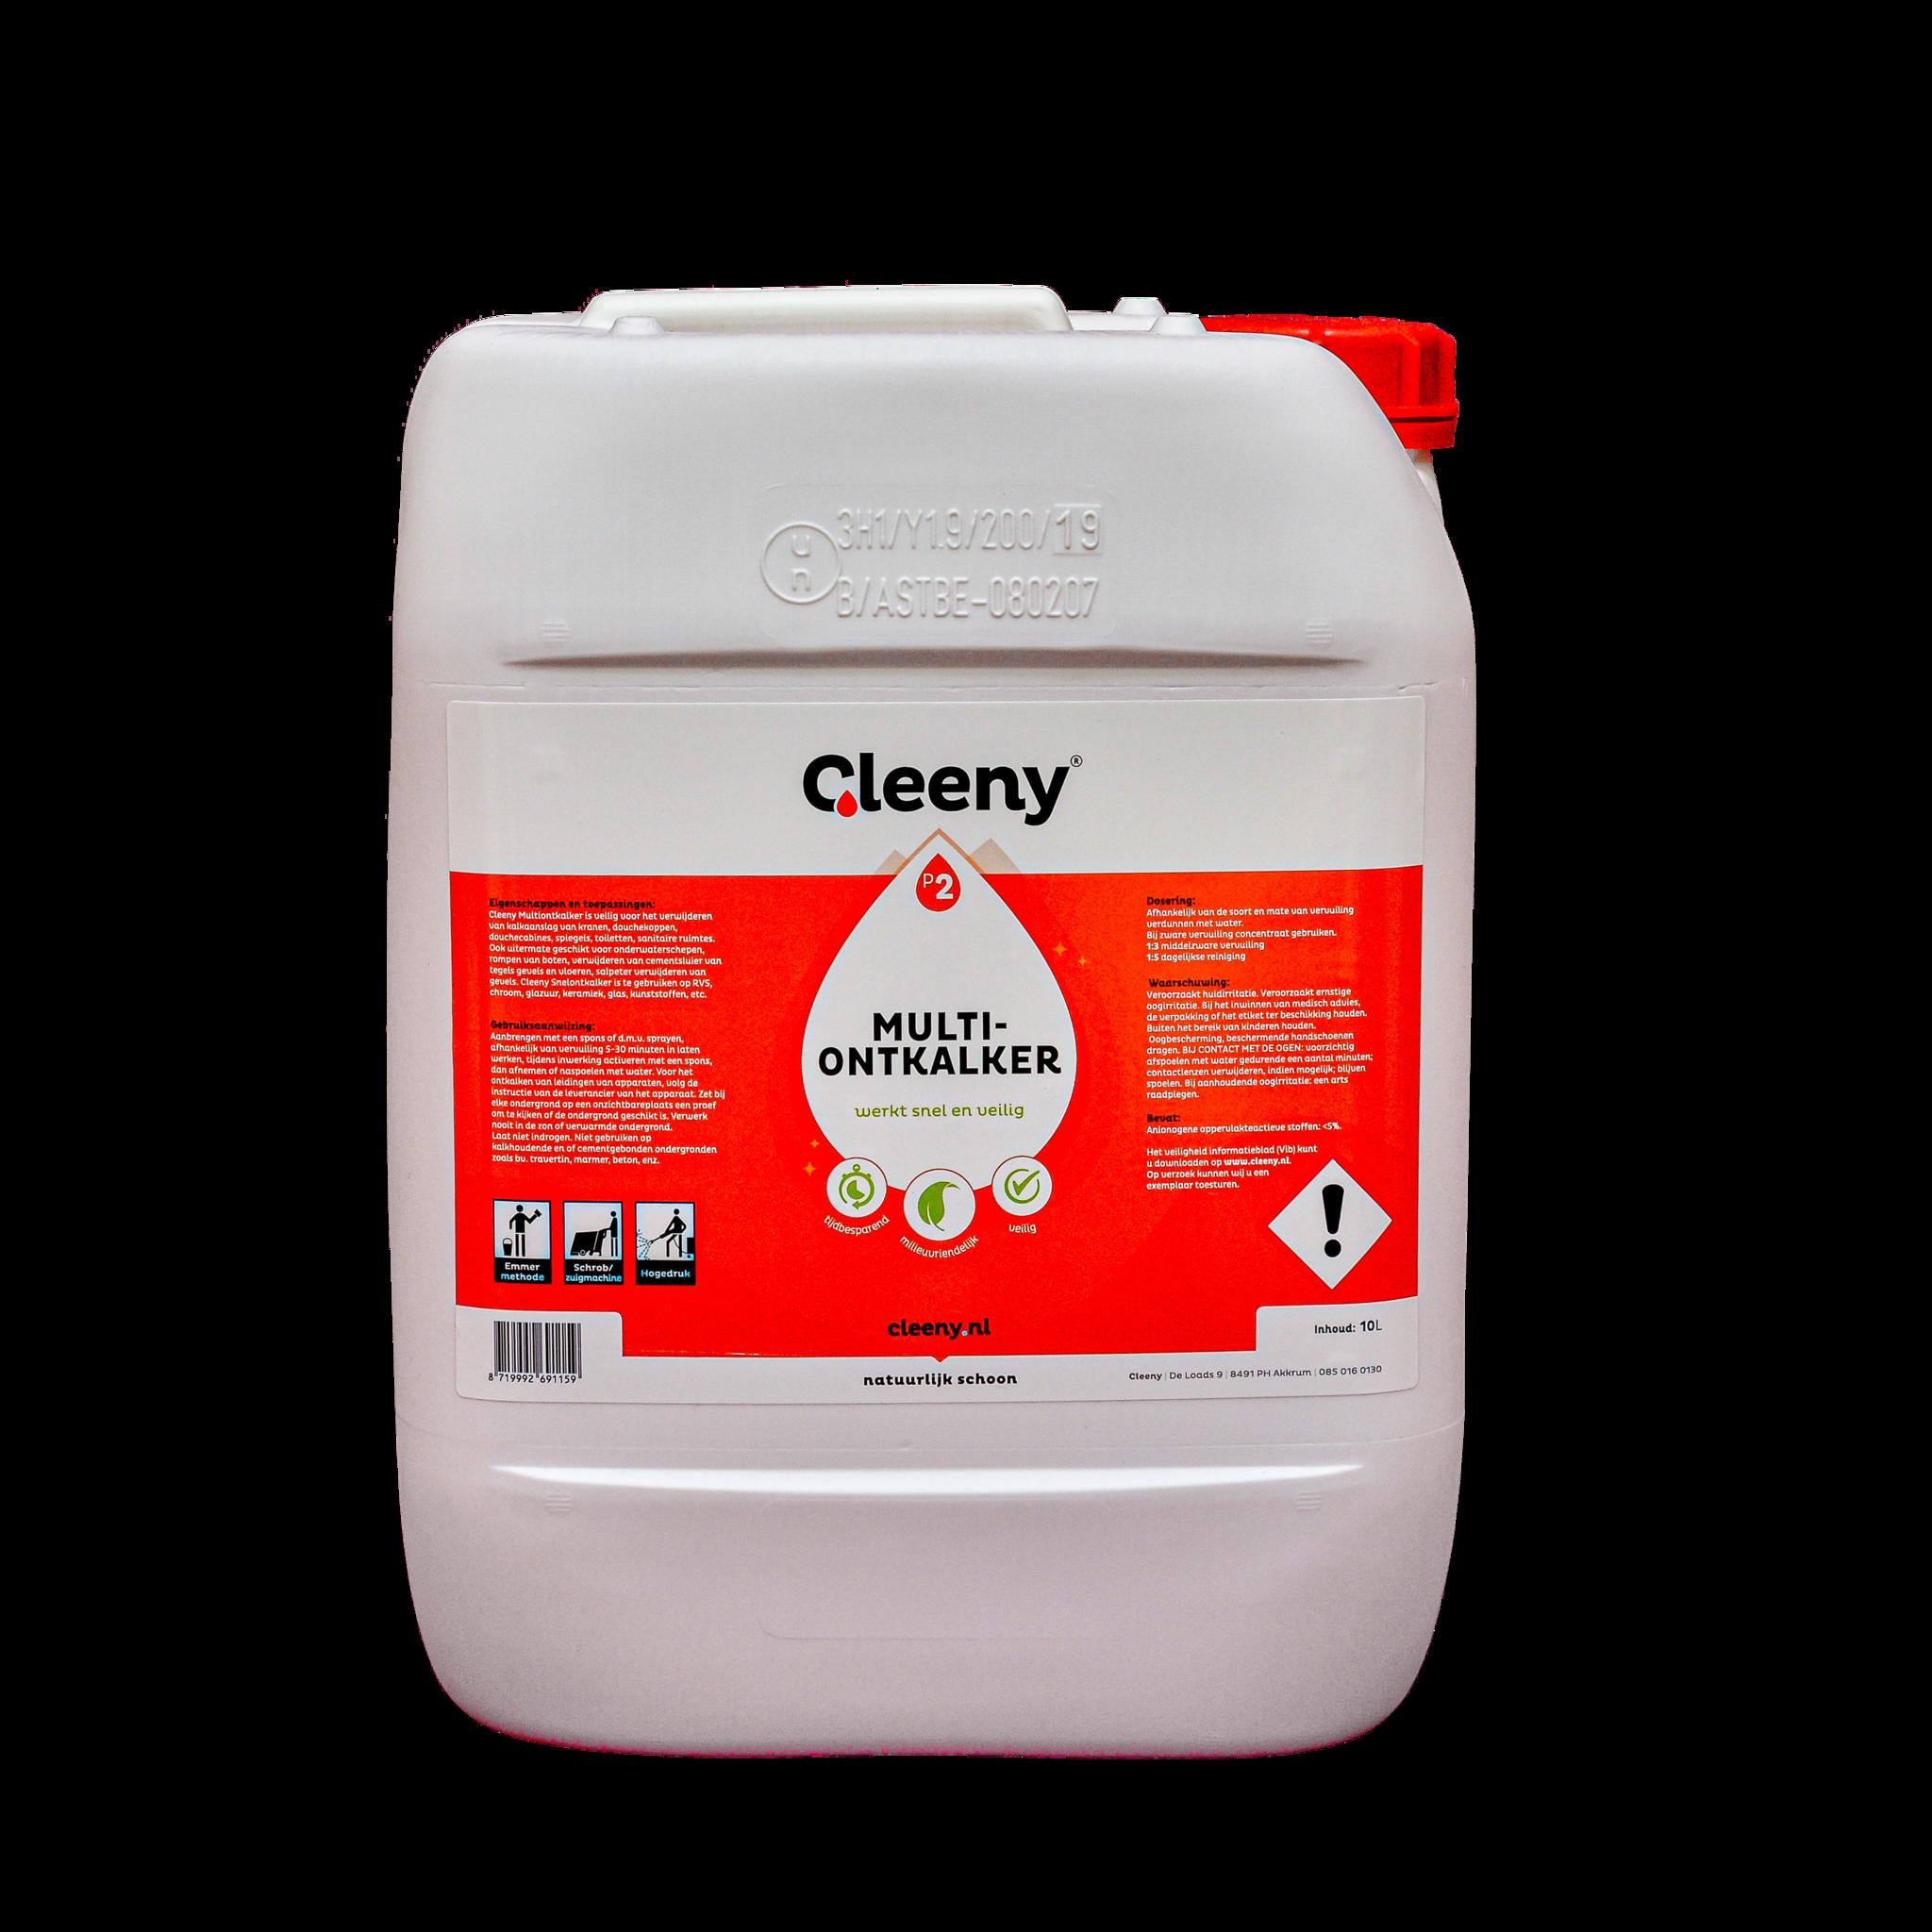 Cleeny Cleeny P2 Multi Entkalker 10 Liter Kanne Konzentrat